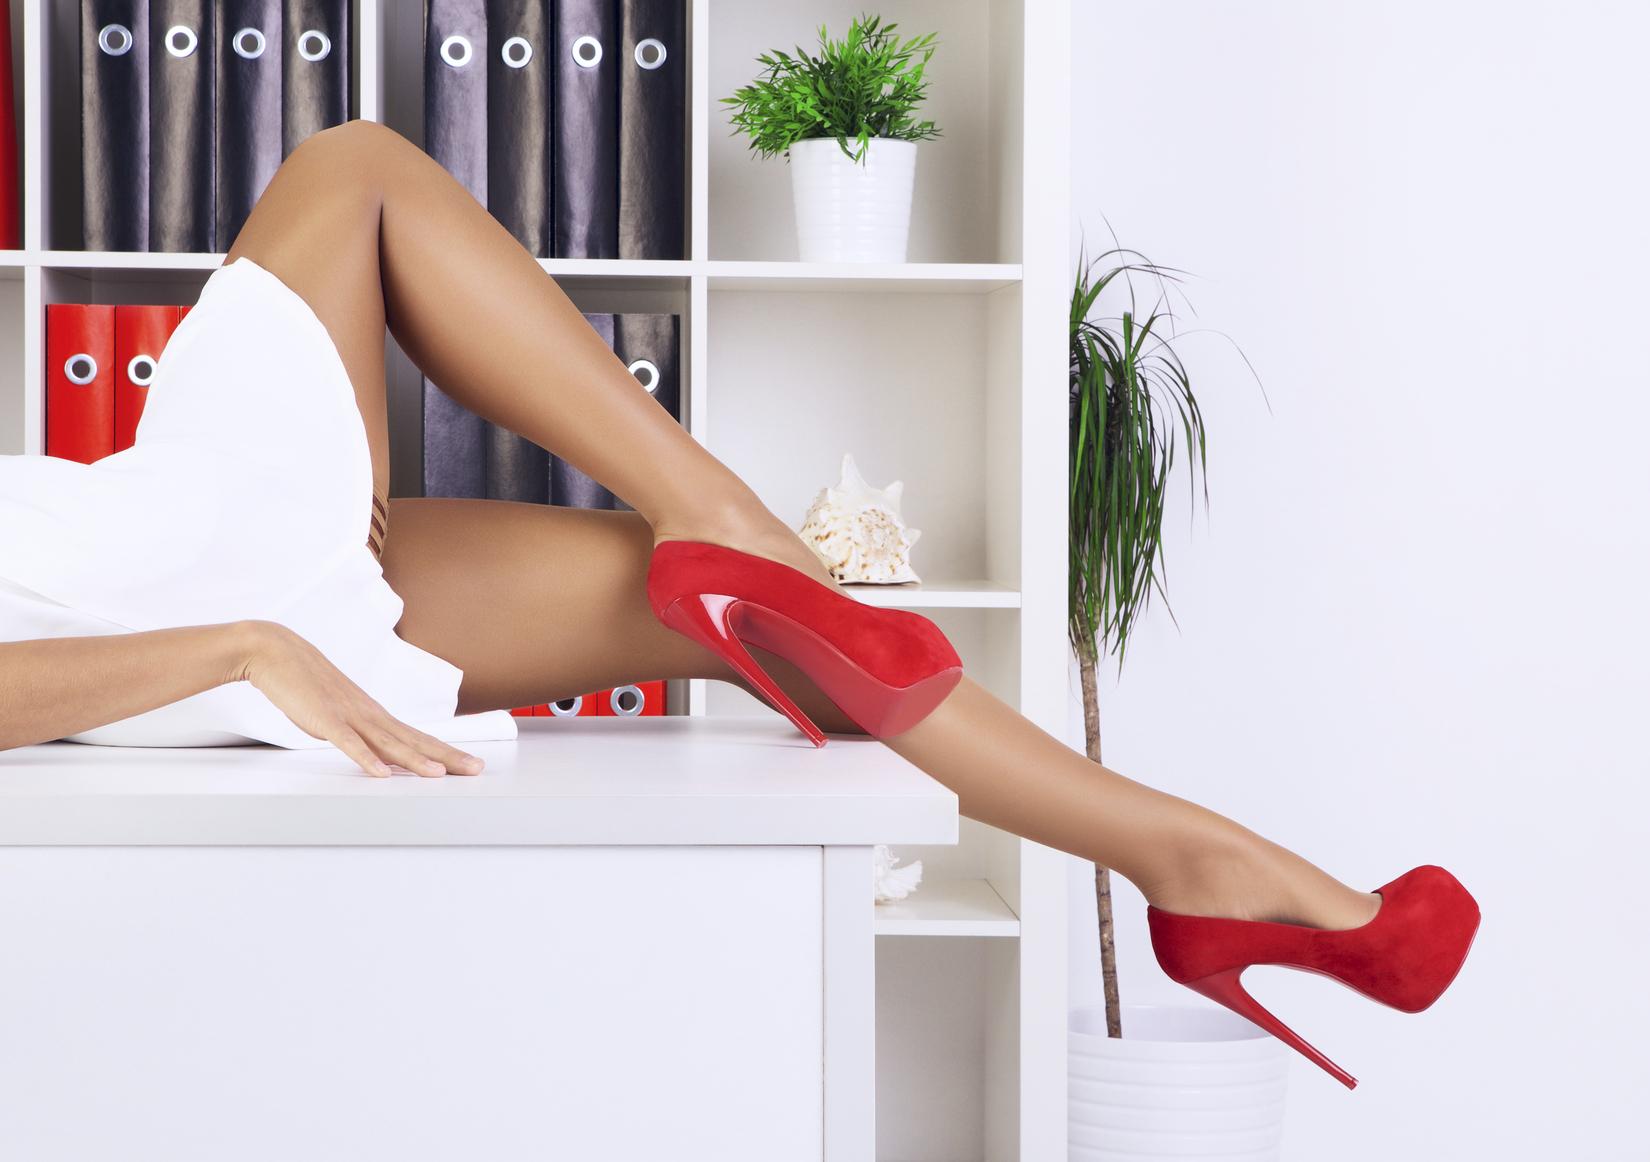 нежность после секса это